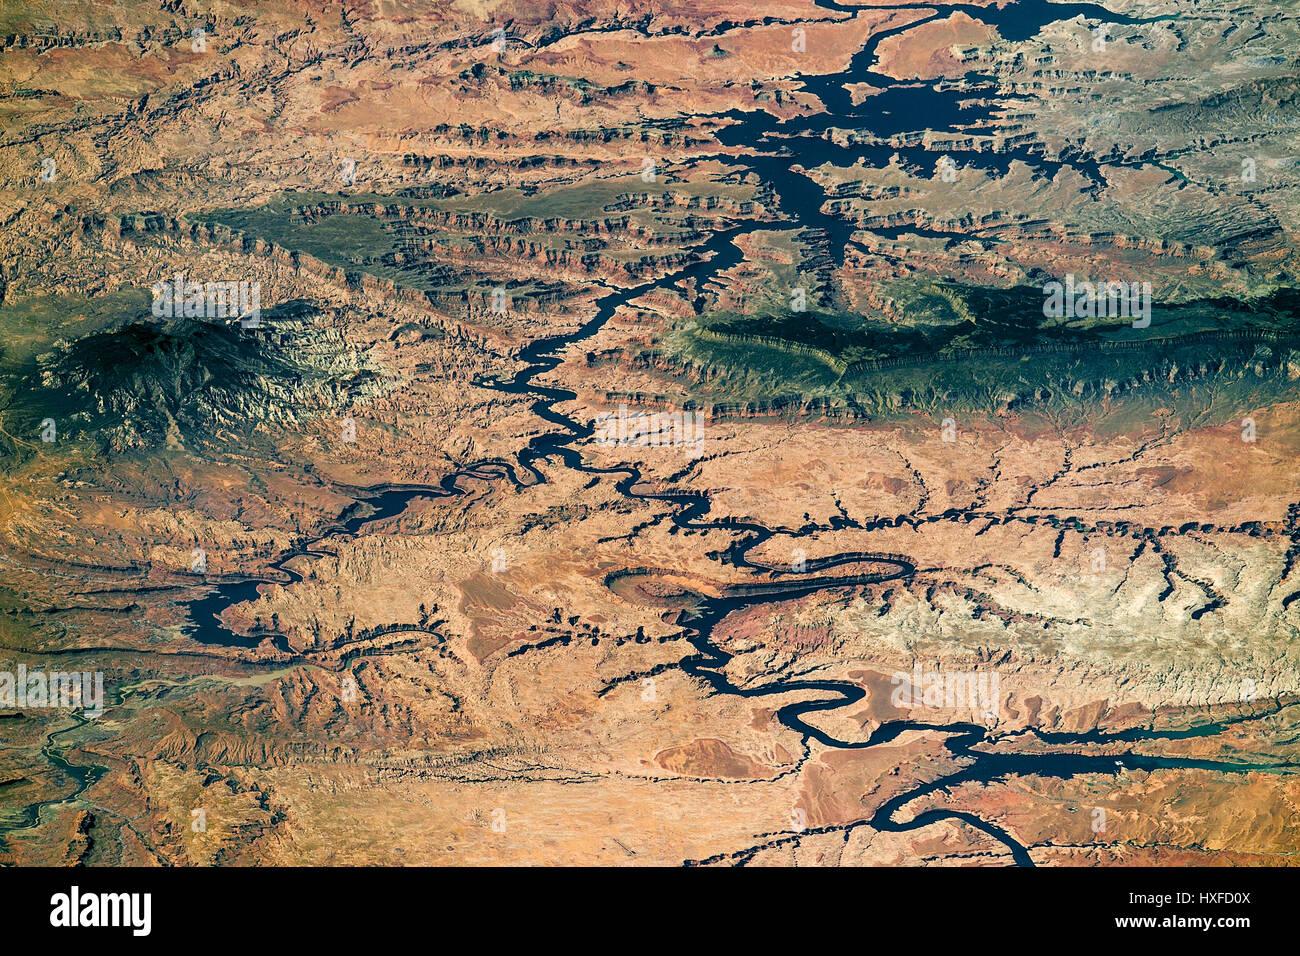 Lake Powell and the Colorad River, Arizona/Utah border, USA. ISS image - Stock Image